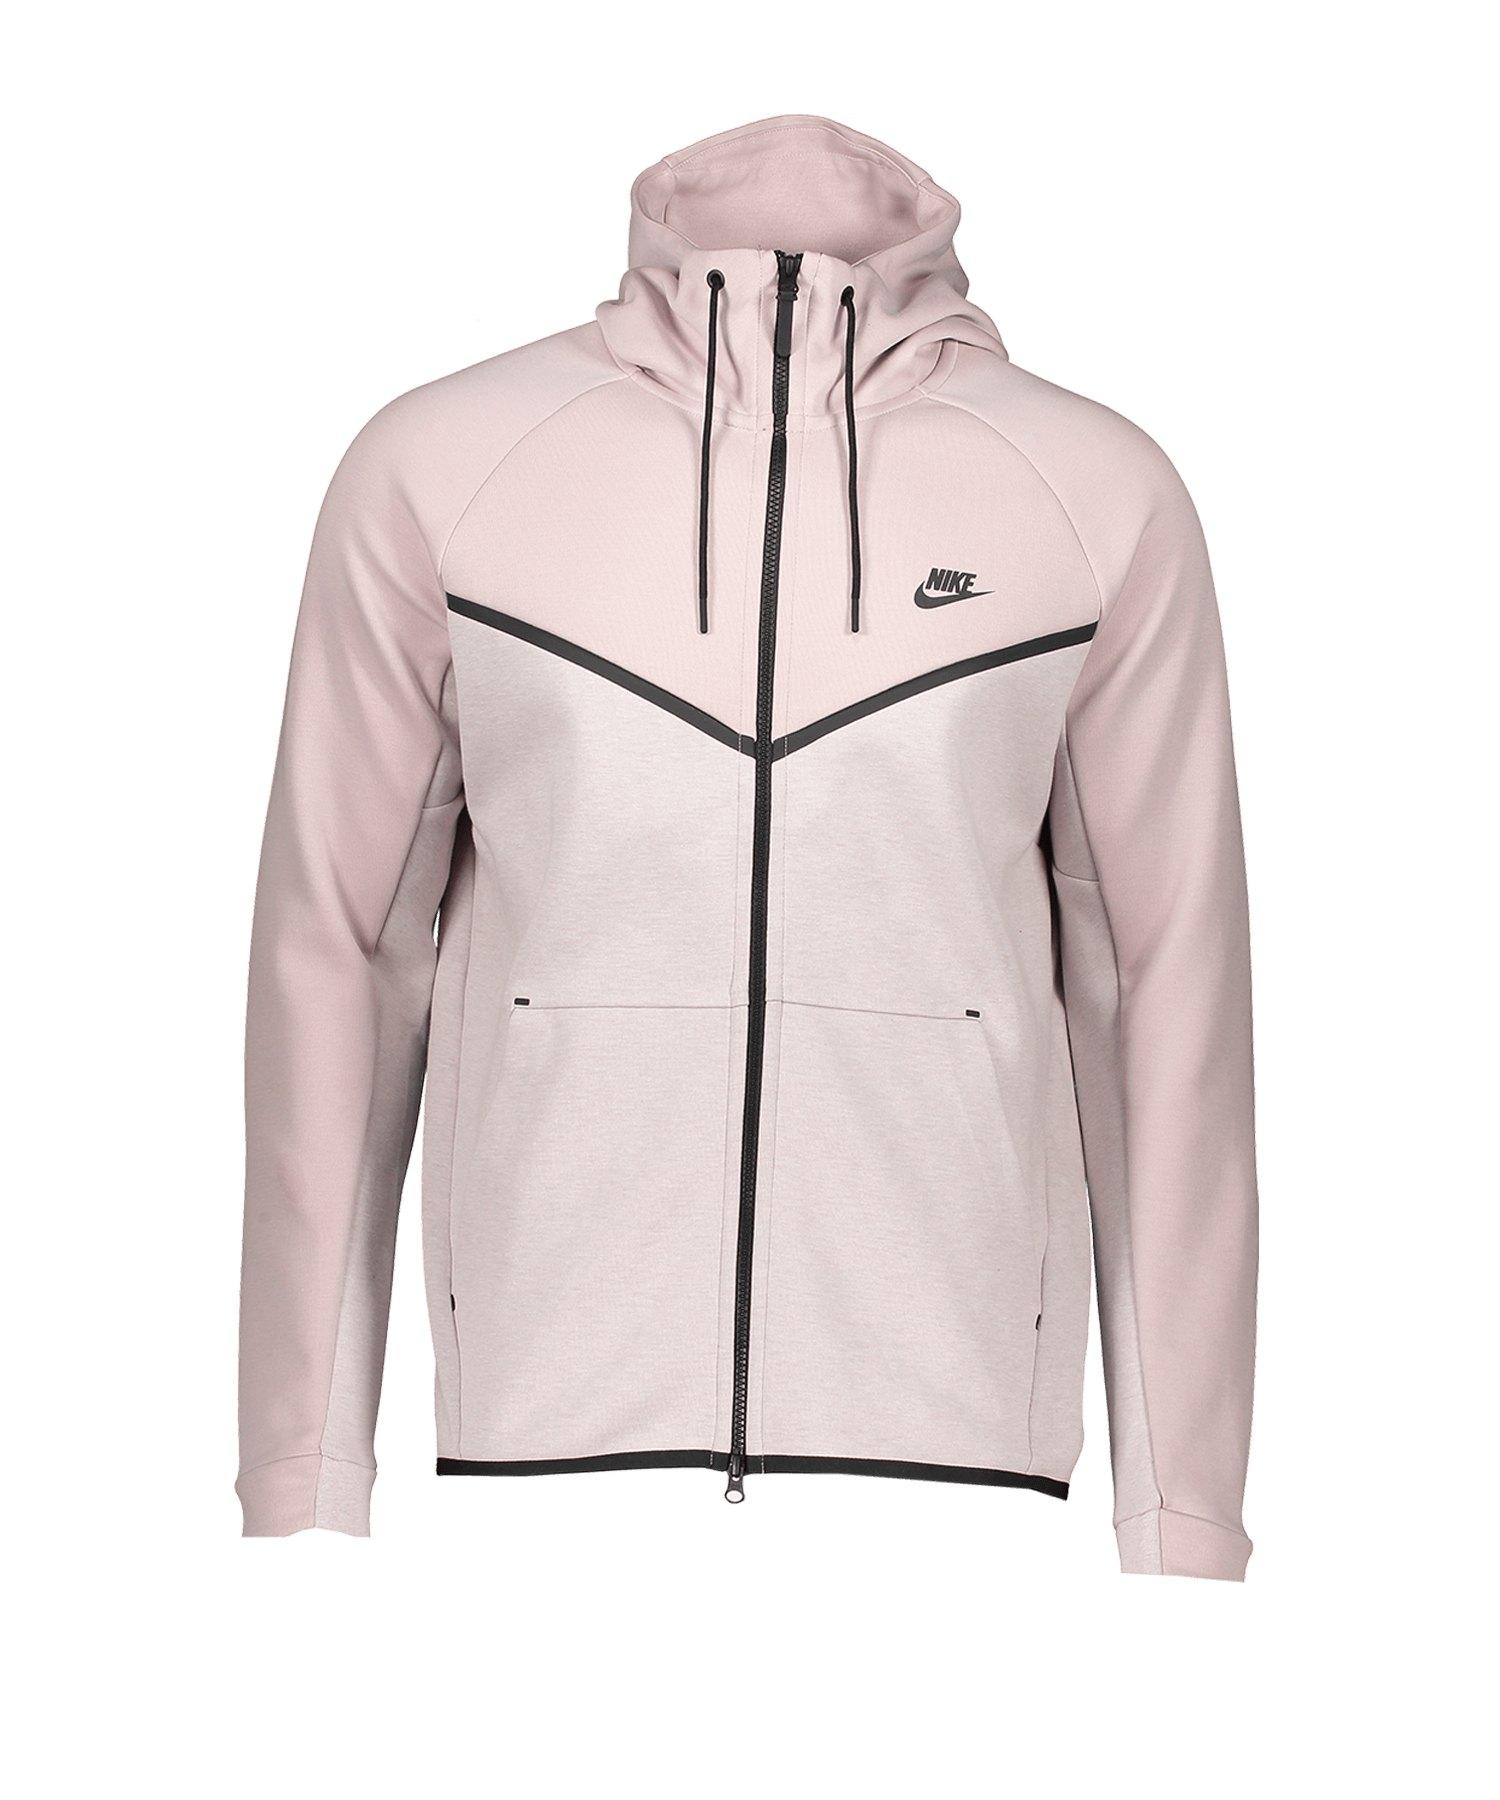 Nike Tech Fleece Windrunner Kapuzenjacke F684 - braun